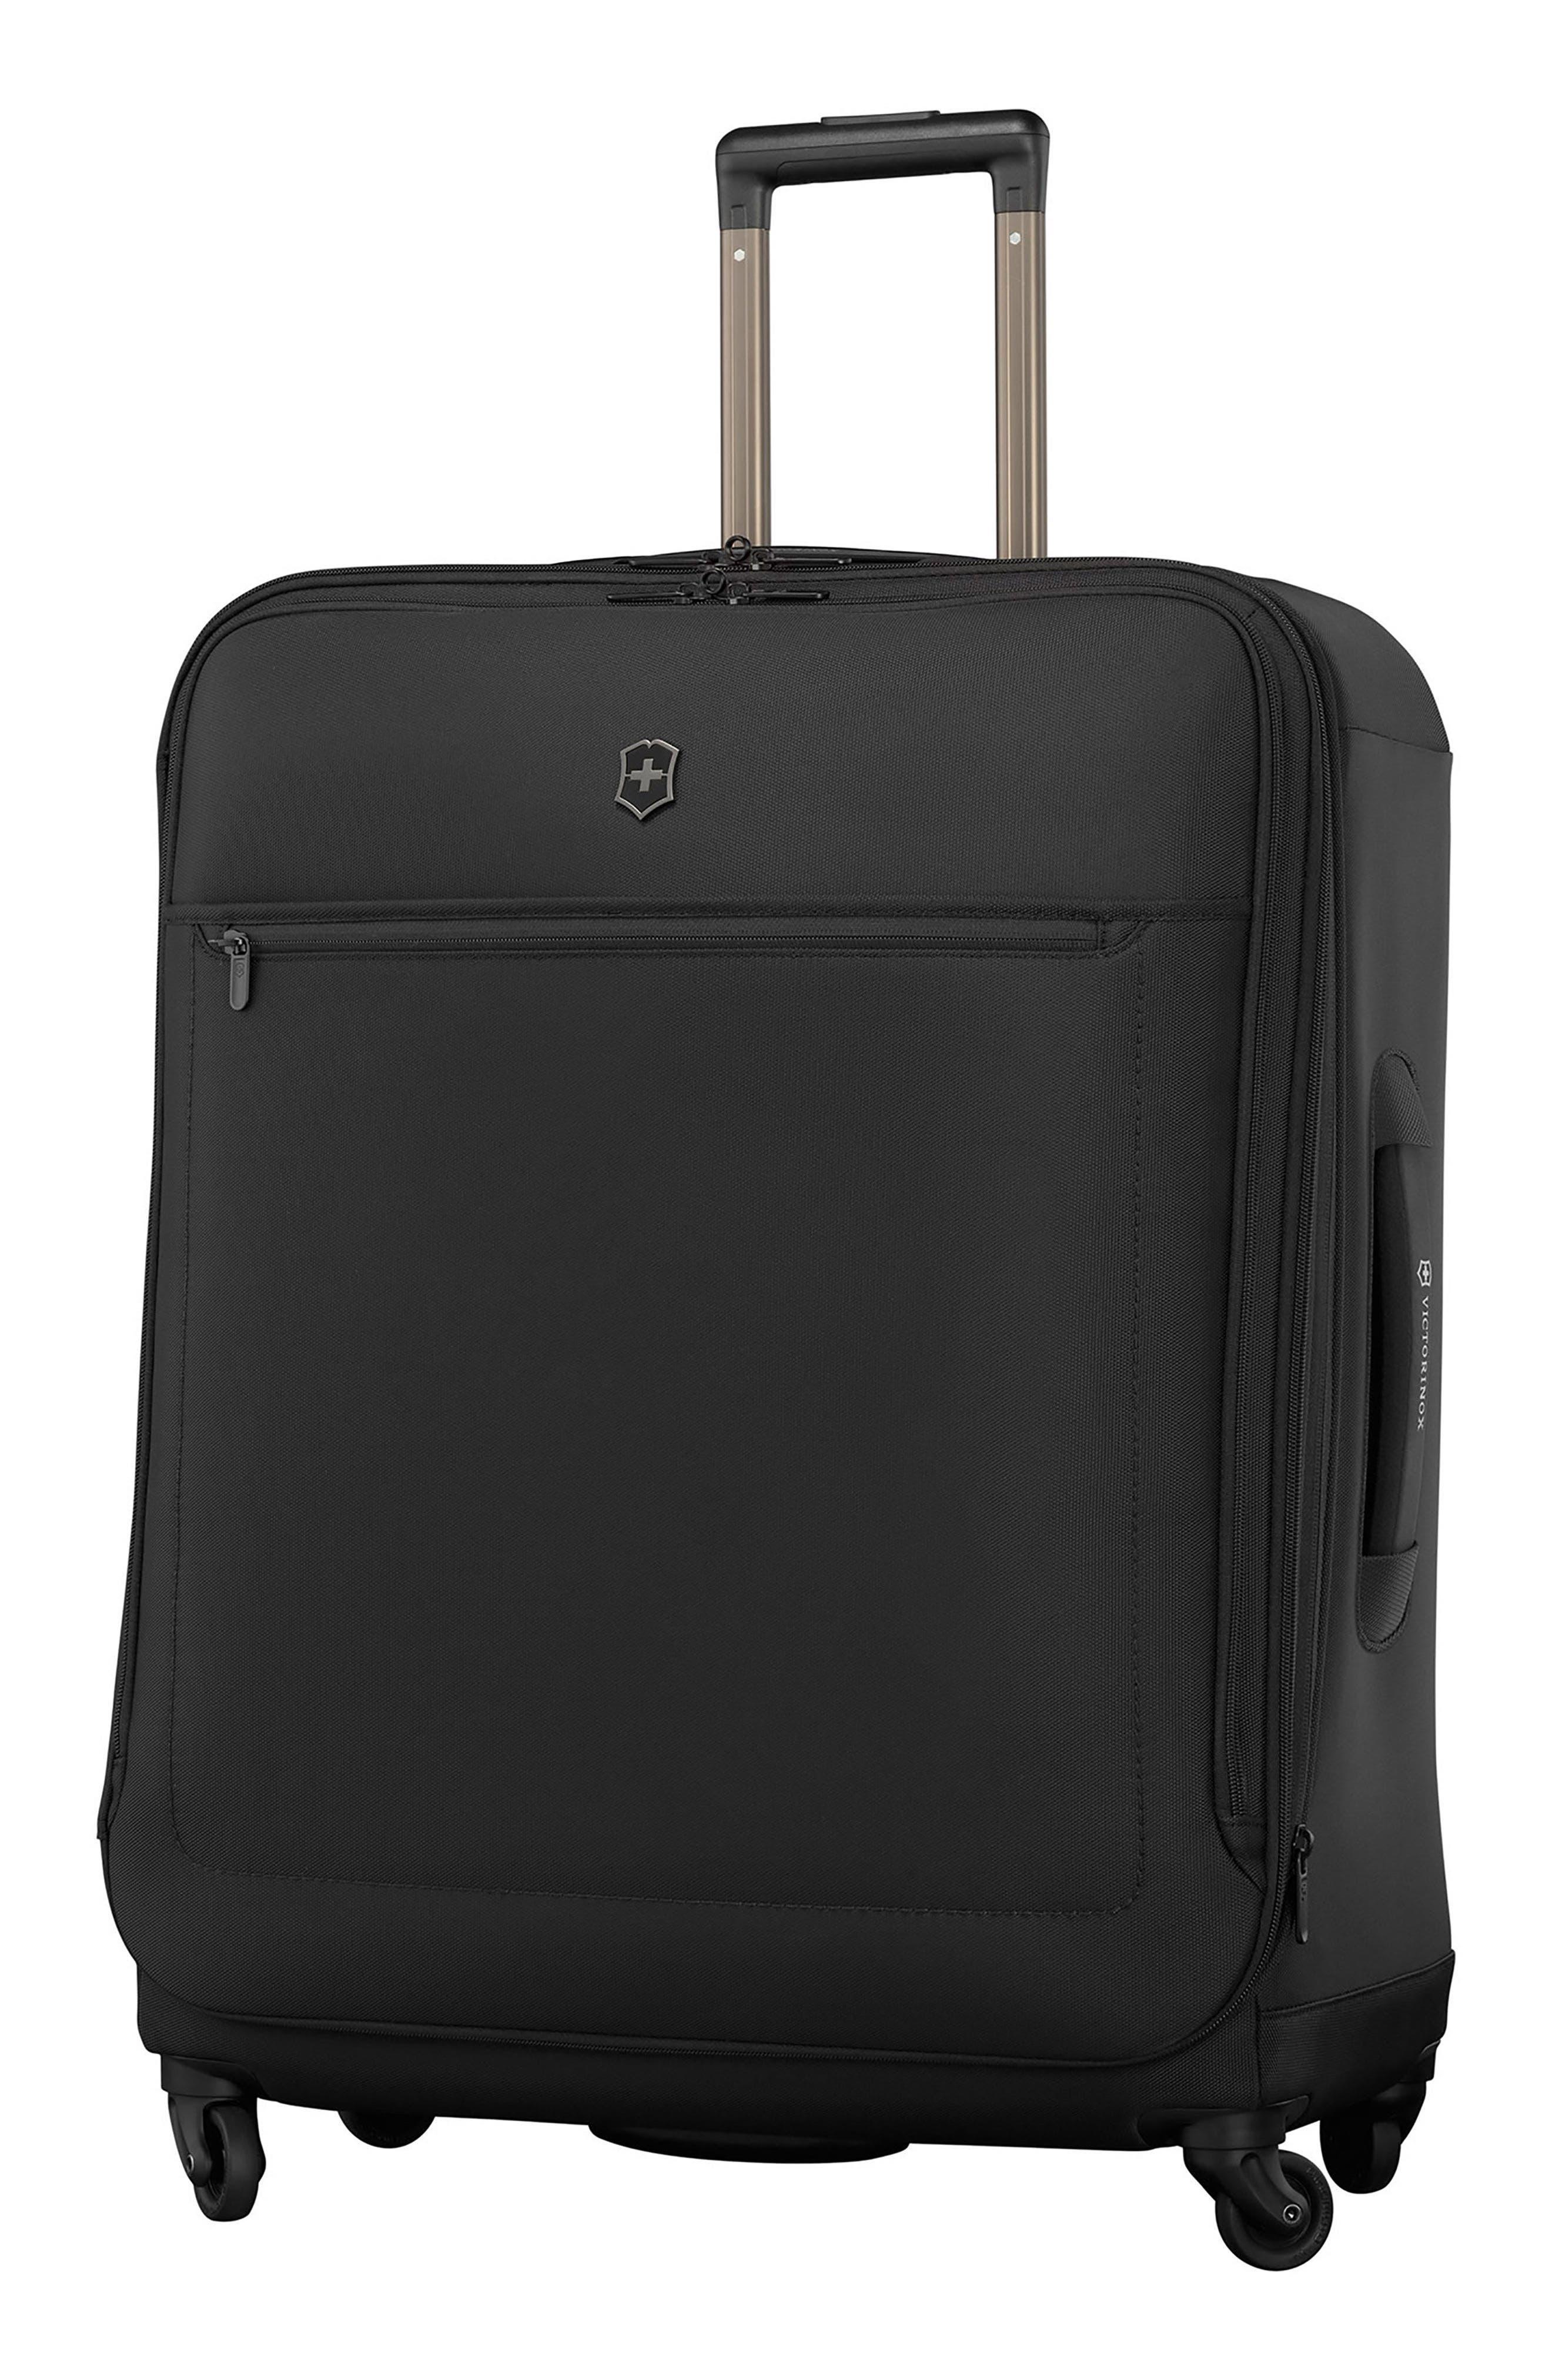 Victorinox Swiss Army® Avolve 3.0 28 Inch Wheeled Packing Case